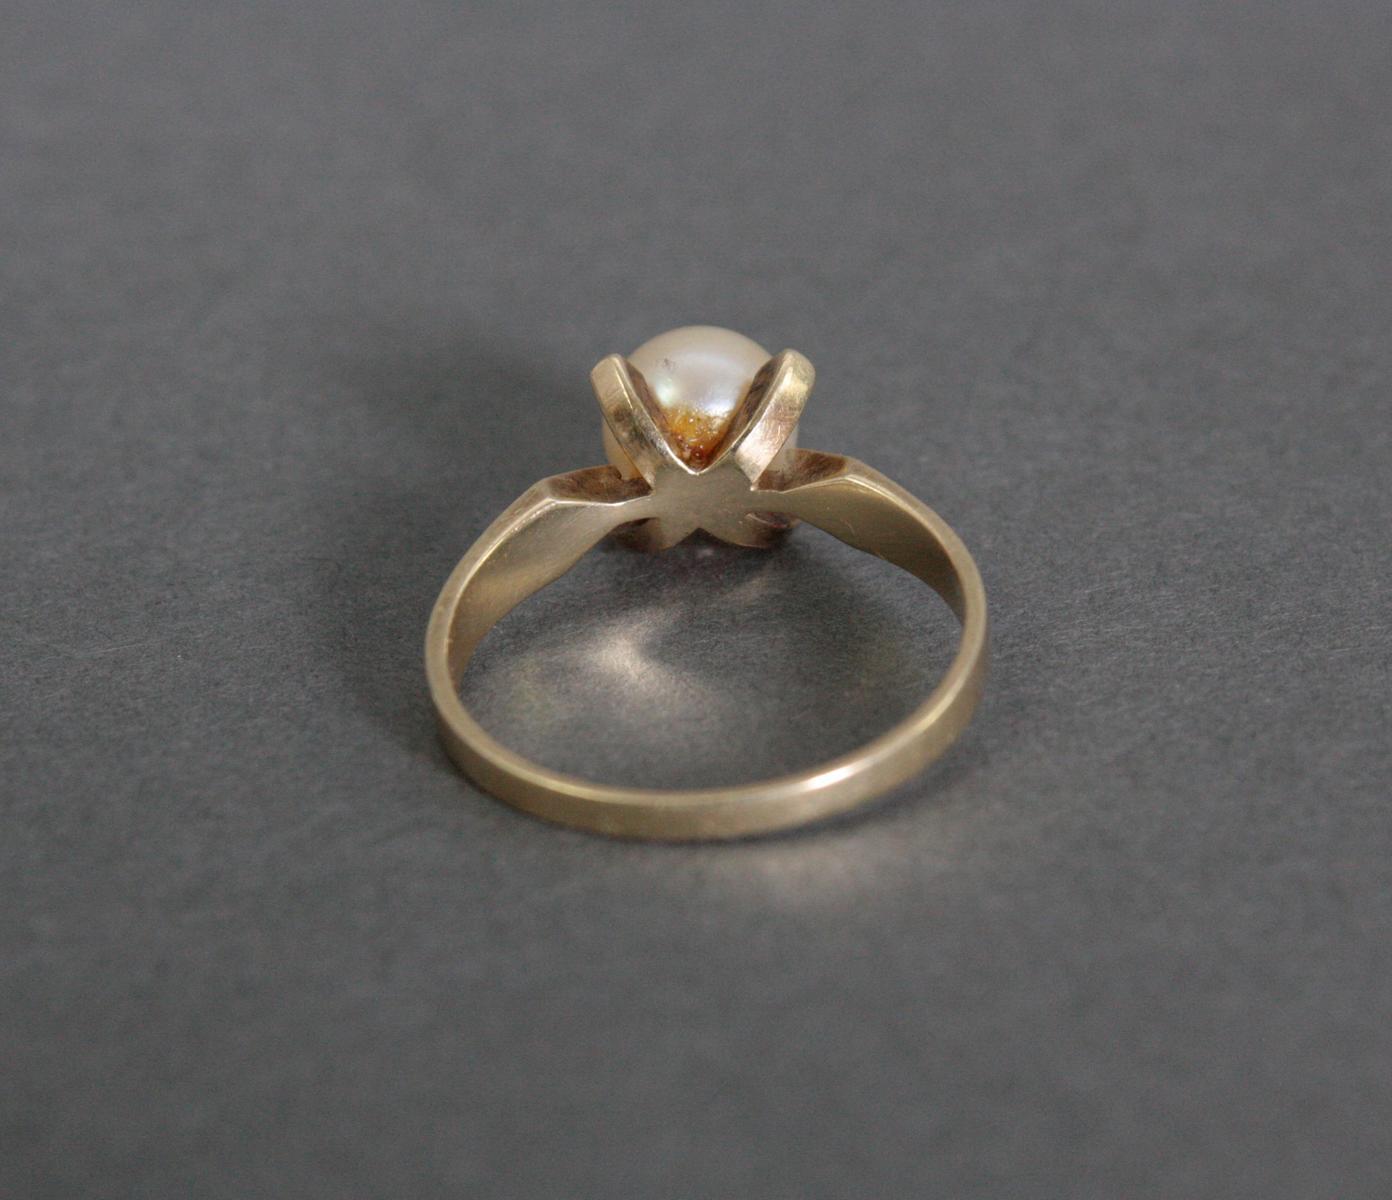 Damenring mit Perle, 14 Karat Gelbgold-3